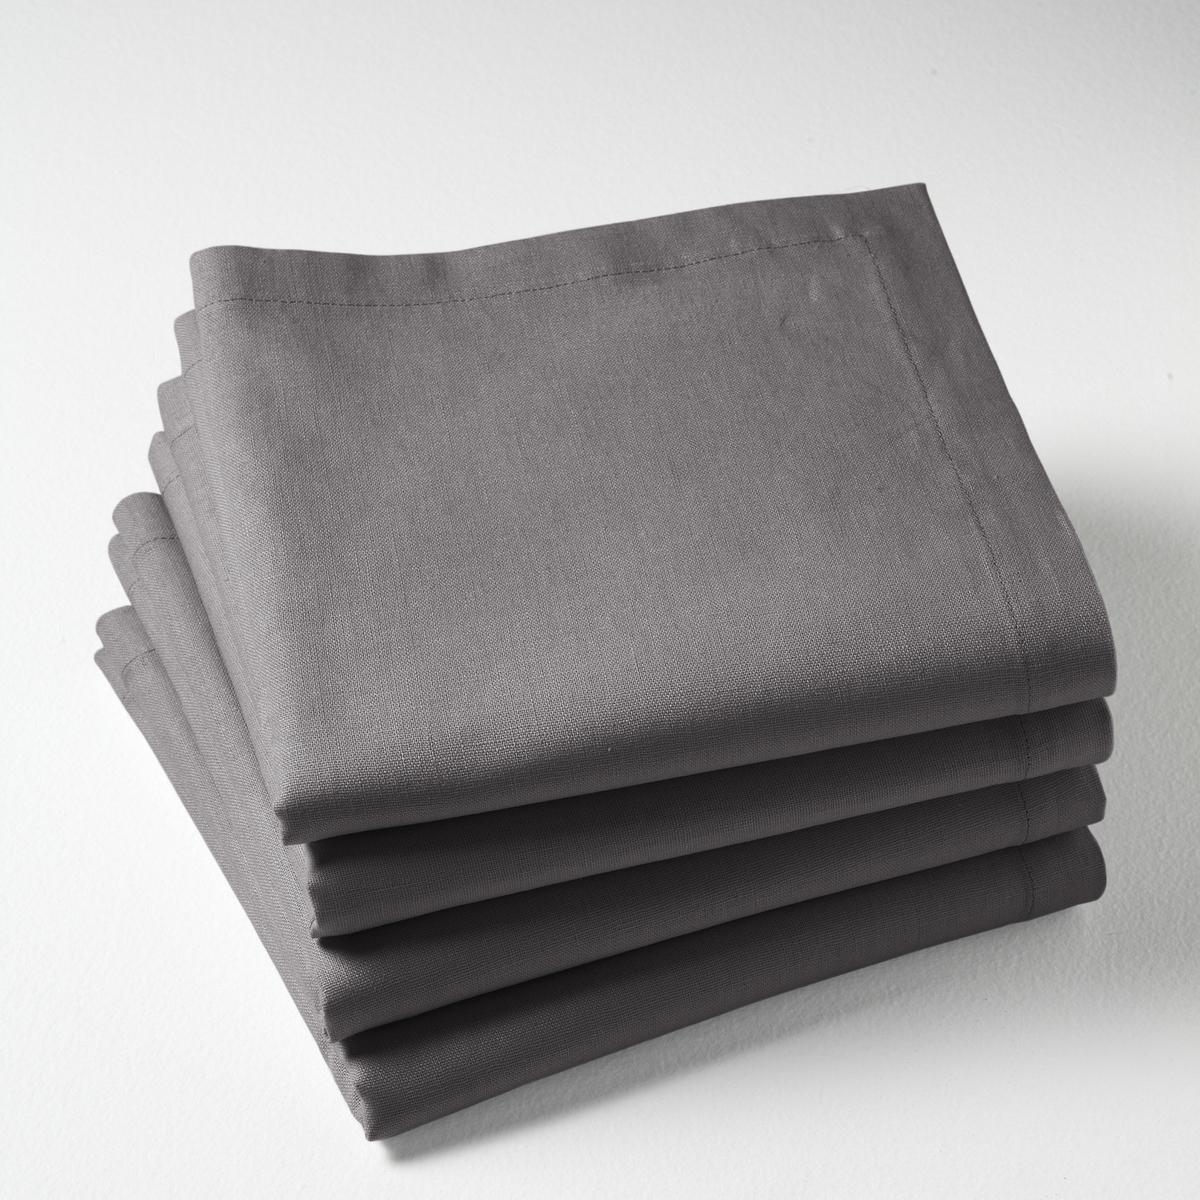 Комплект из салфеток из La Redoute Льна и хлопка BORDER 45 x 45 см серый комплект из полотенце для la redoute рук из хлопка и льна nipaly 50 x 100 см белый